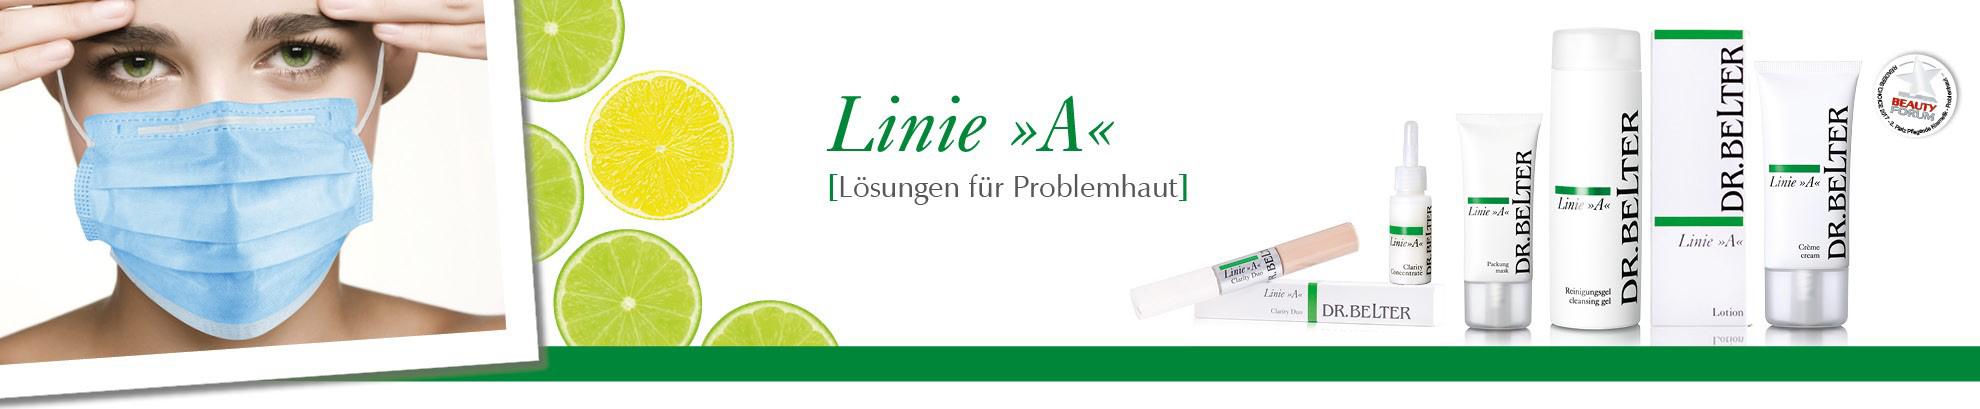 blog_head_linie-a_maskne